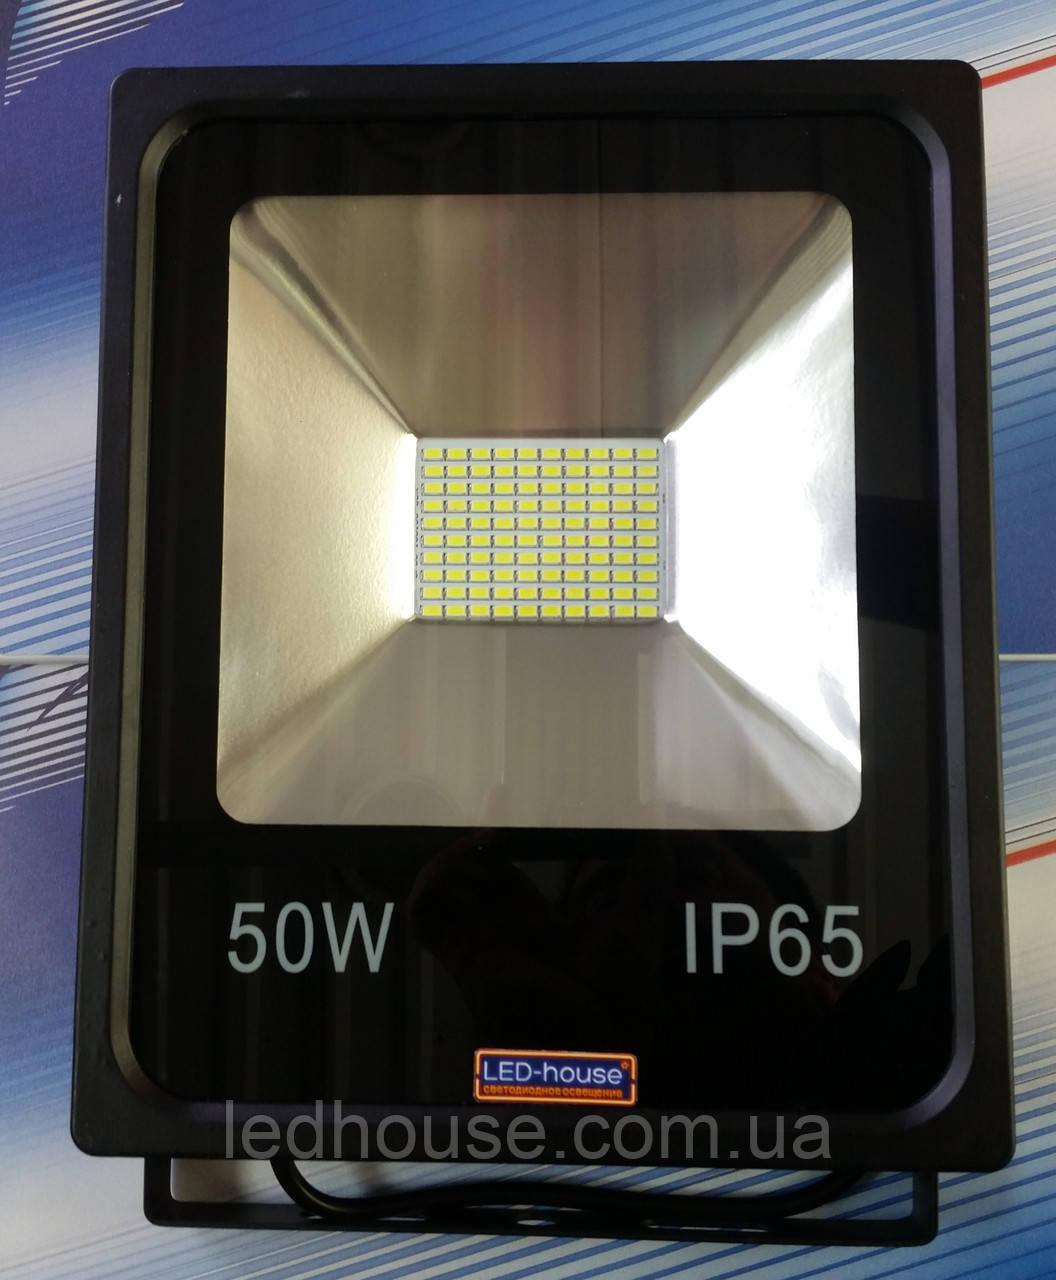 LED прожектор smd 50w Roilux ip65